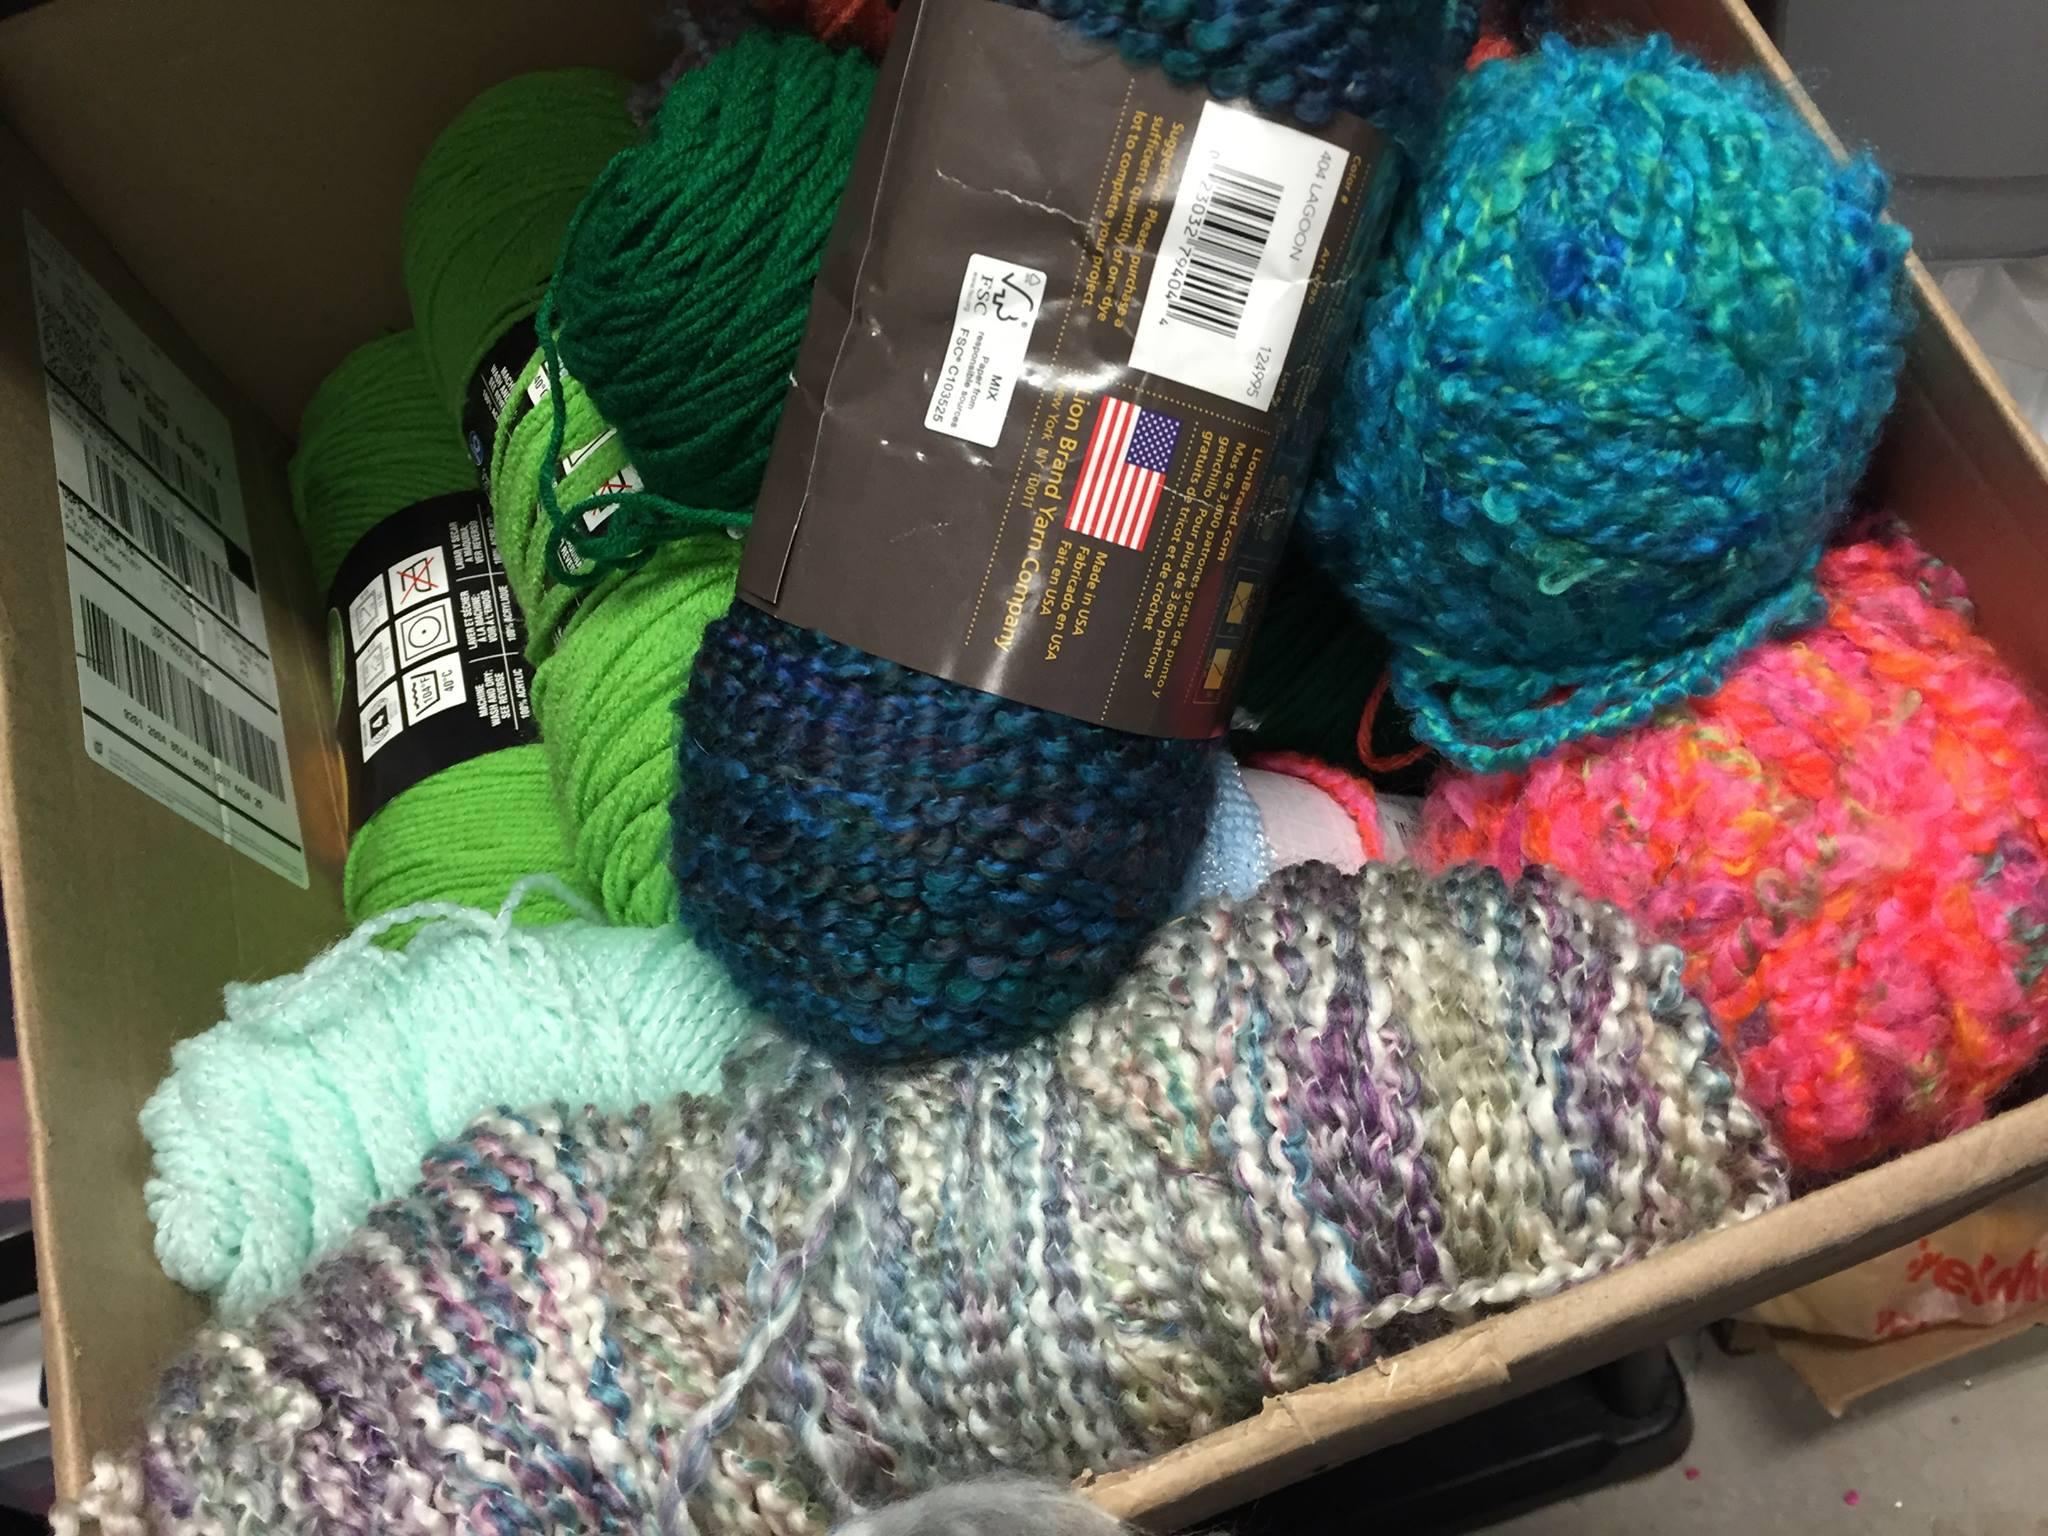 Princess Katie's yarn